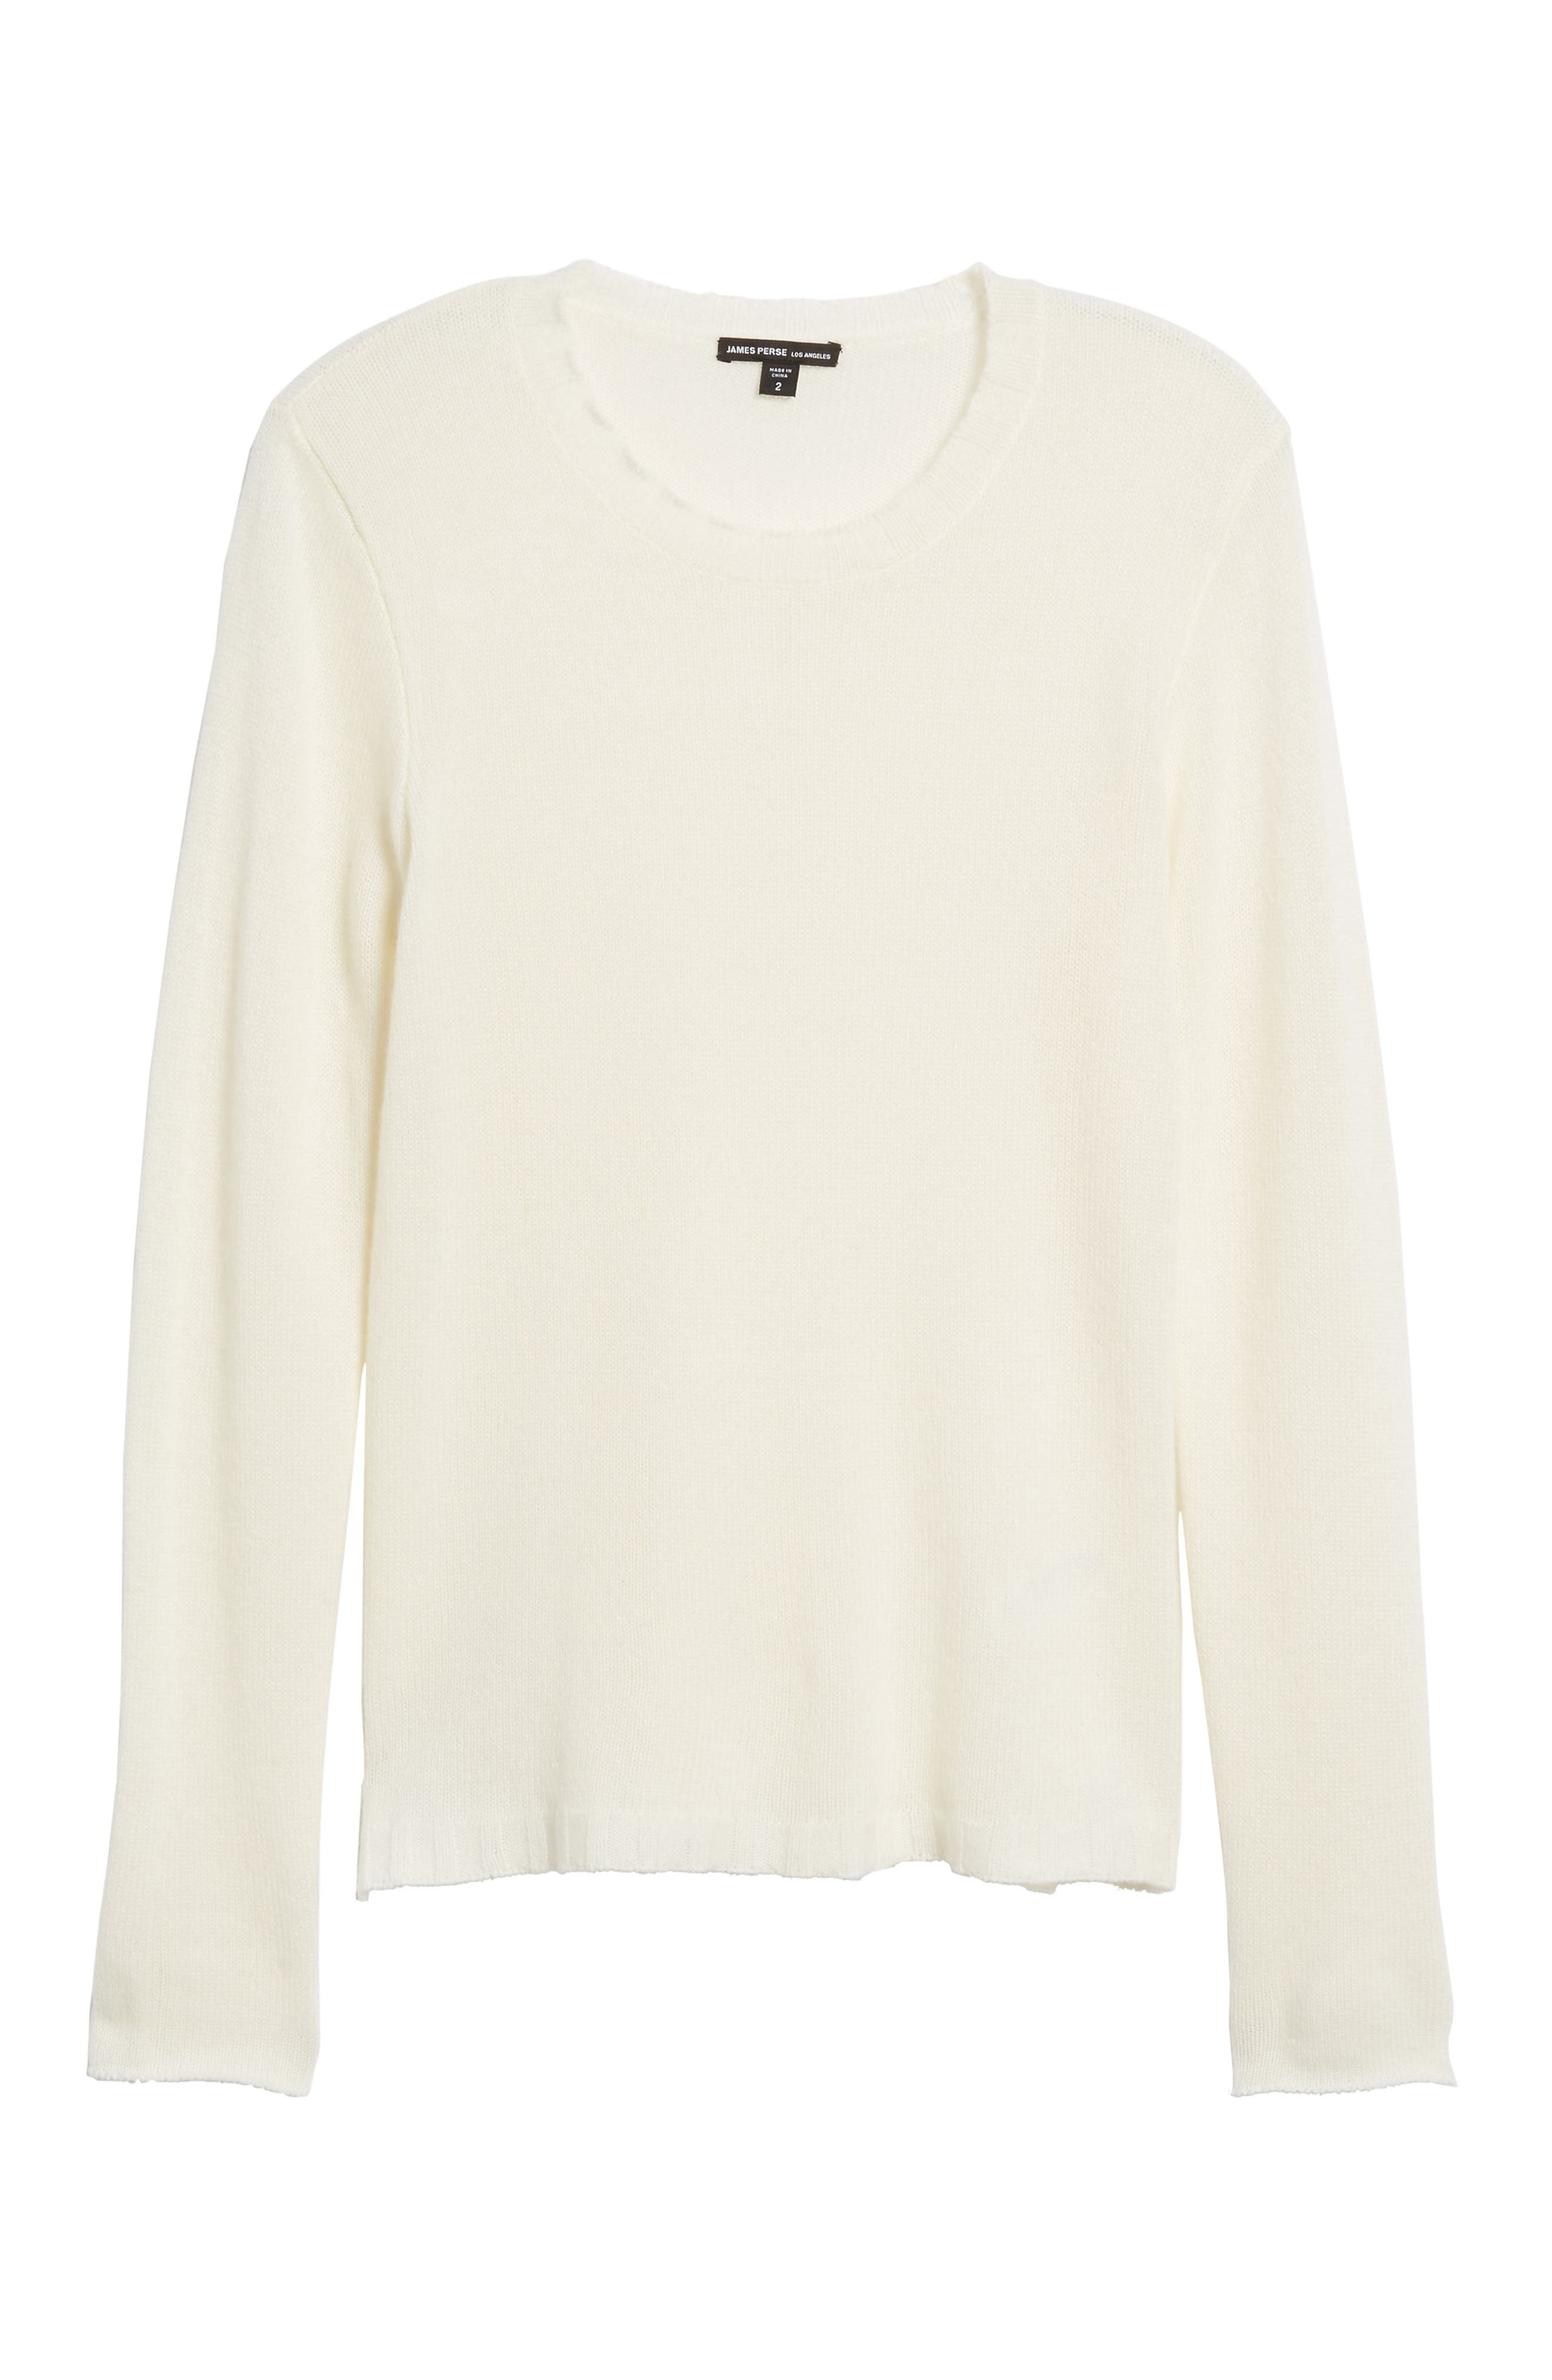 Cashmere Crewneck Sweater,                             Alternate thumbnail 6, color,                             902